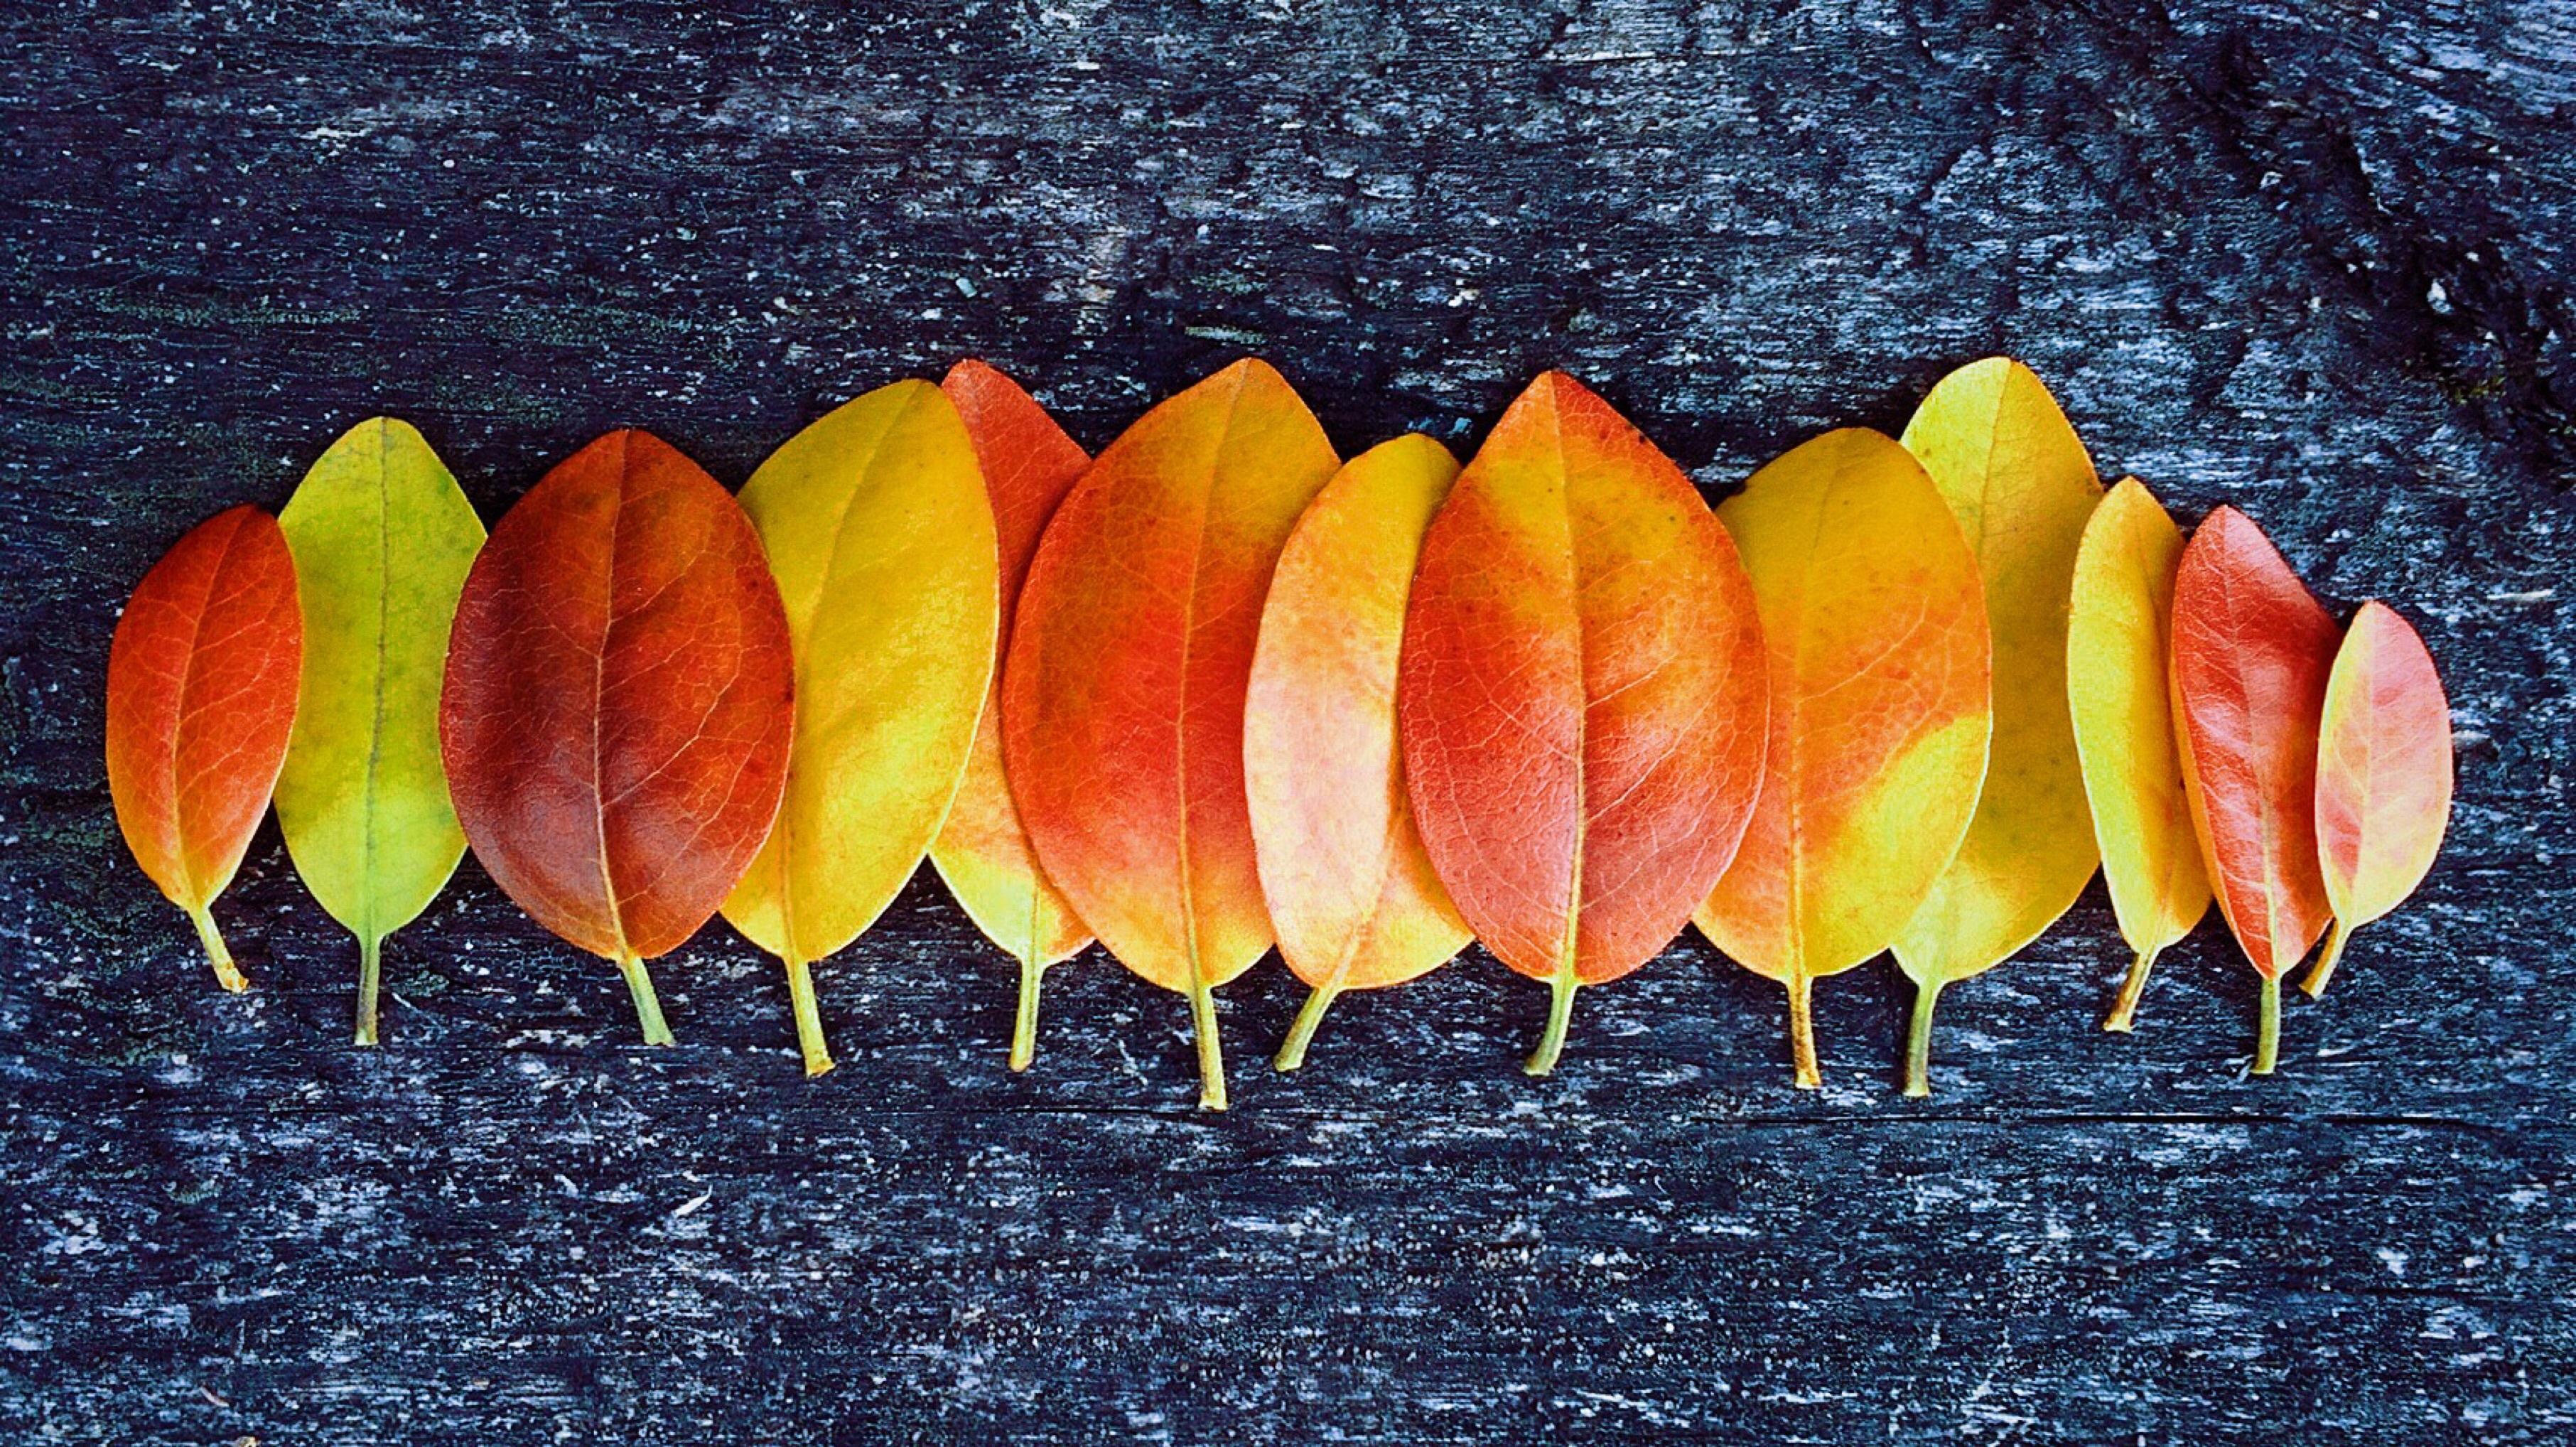 Fotos gratis : hoja, otoño, flor, pétalo, comida, Produce, temporada ...